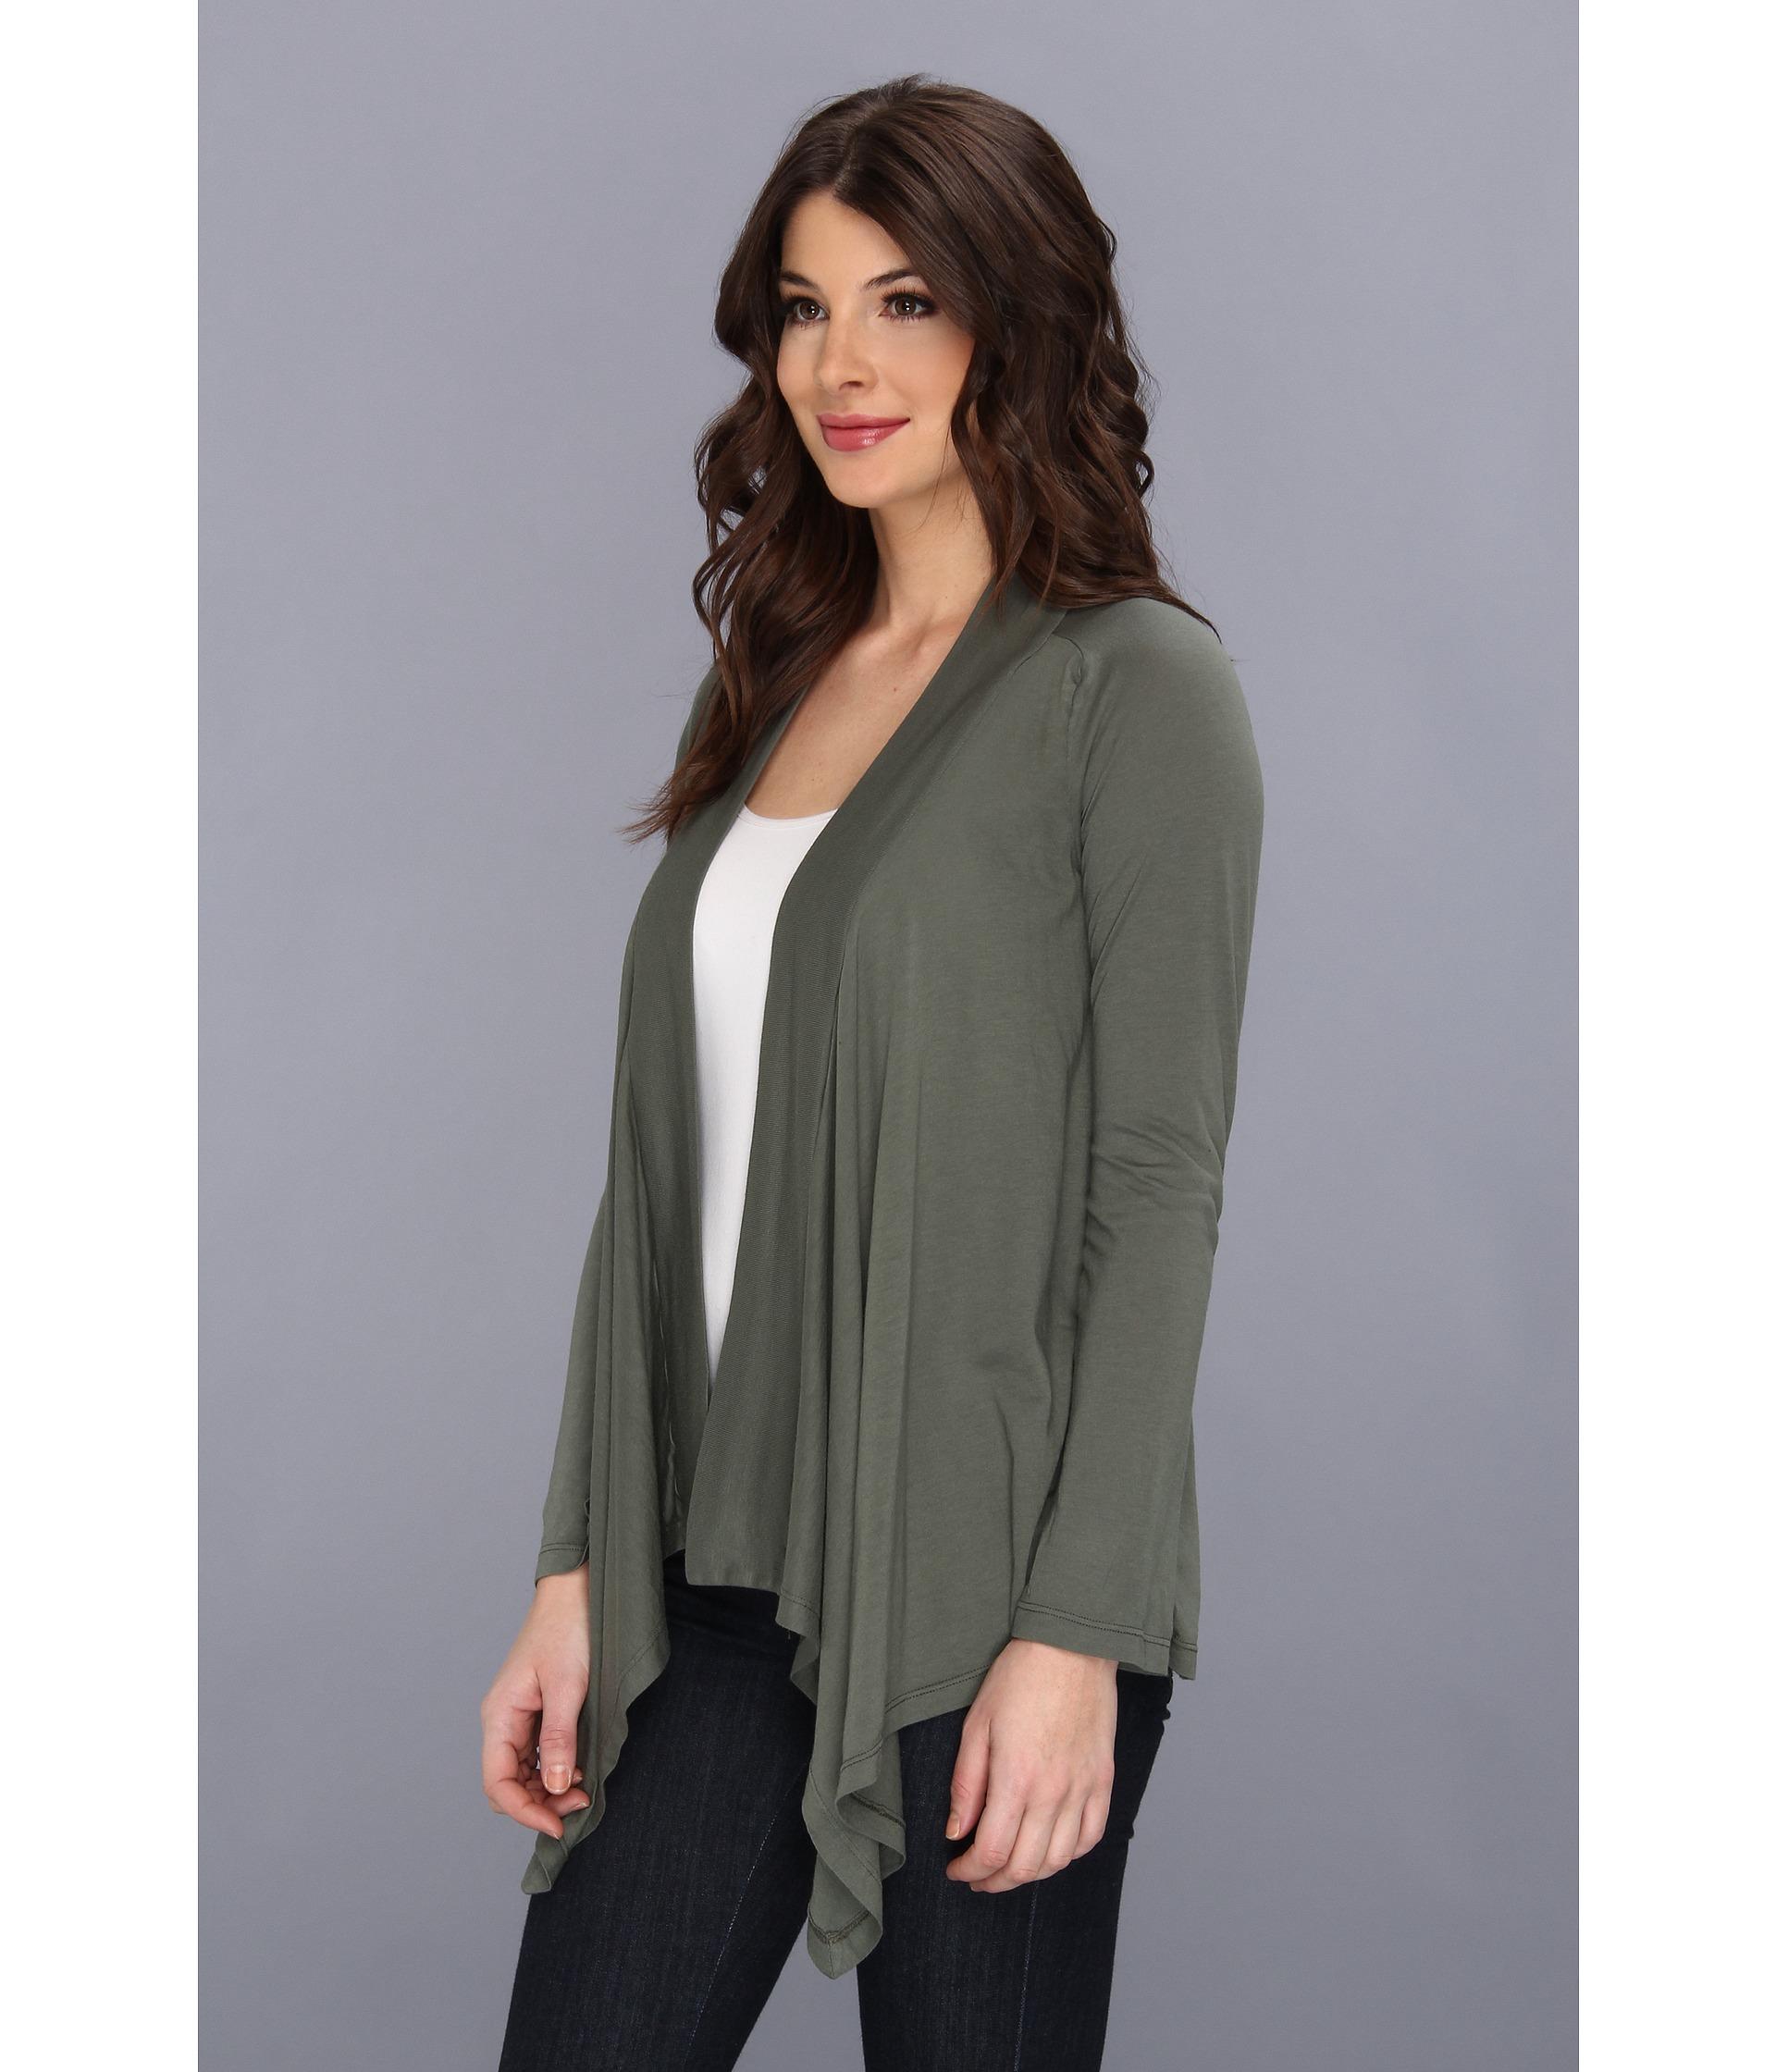 Splendid Very Light Jersey Drape Cardigan In Green